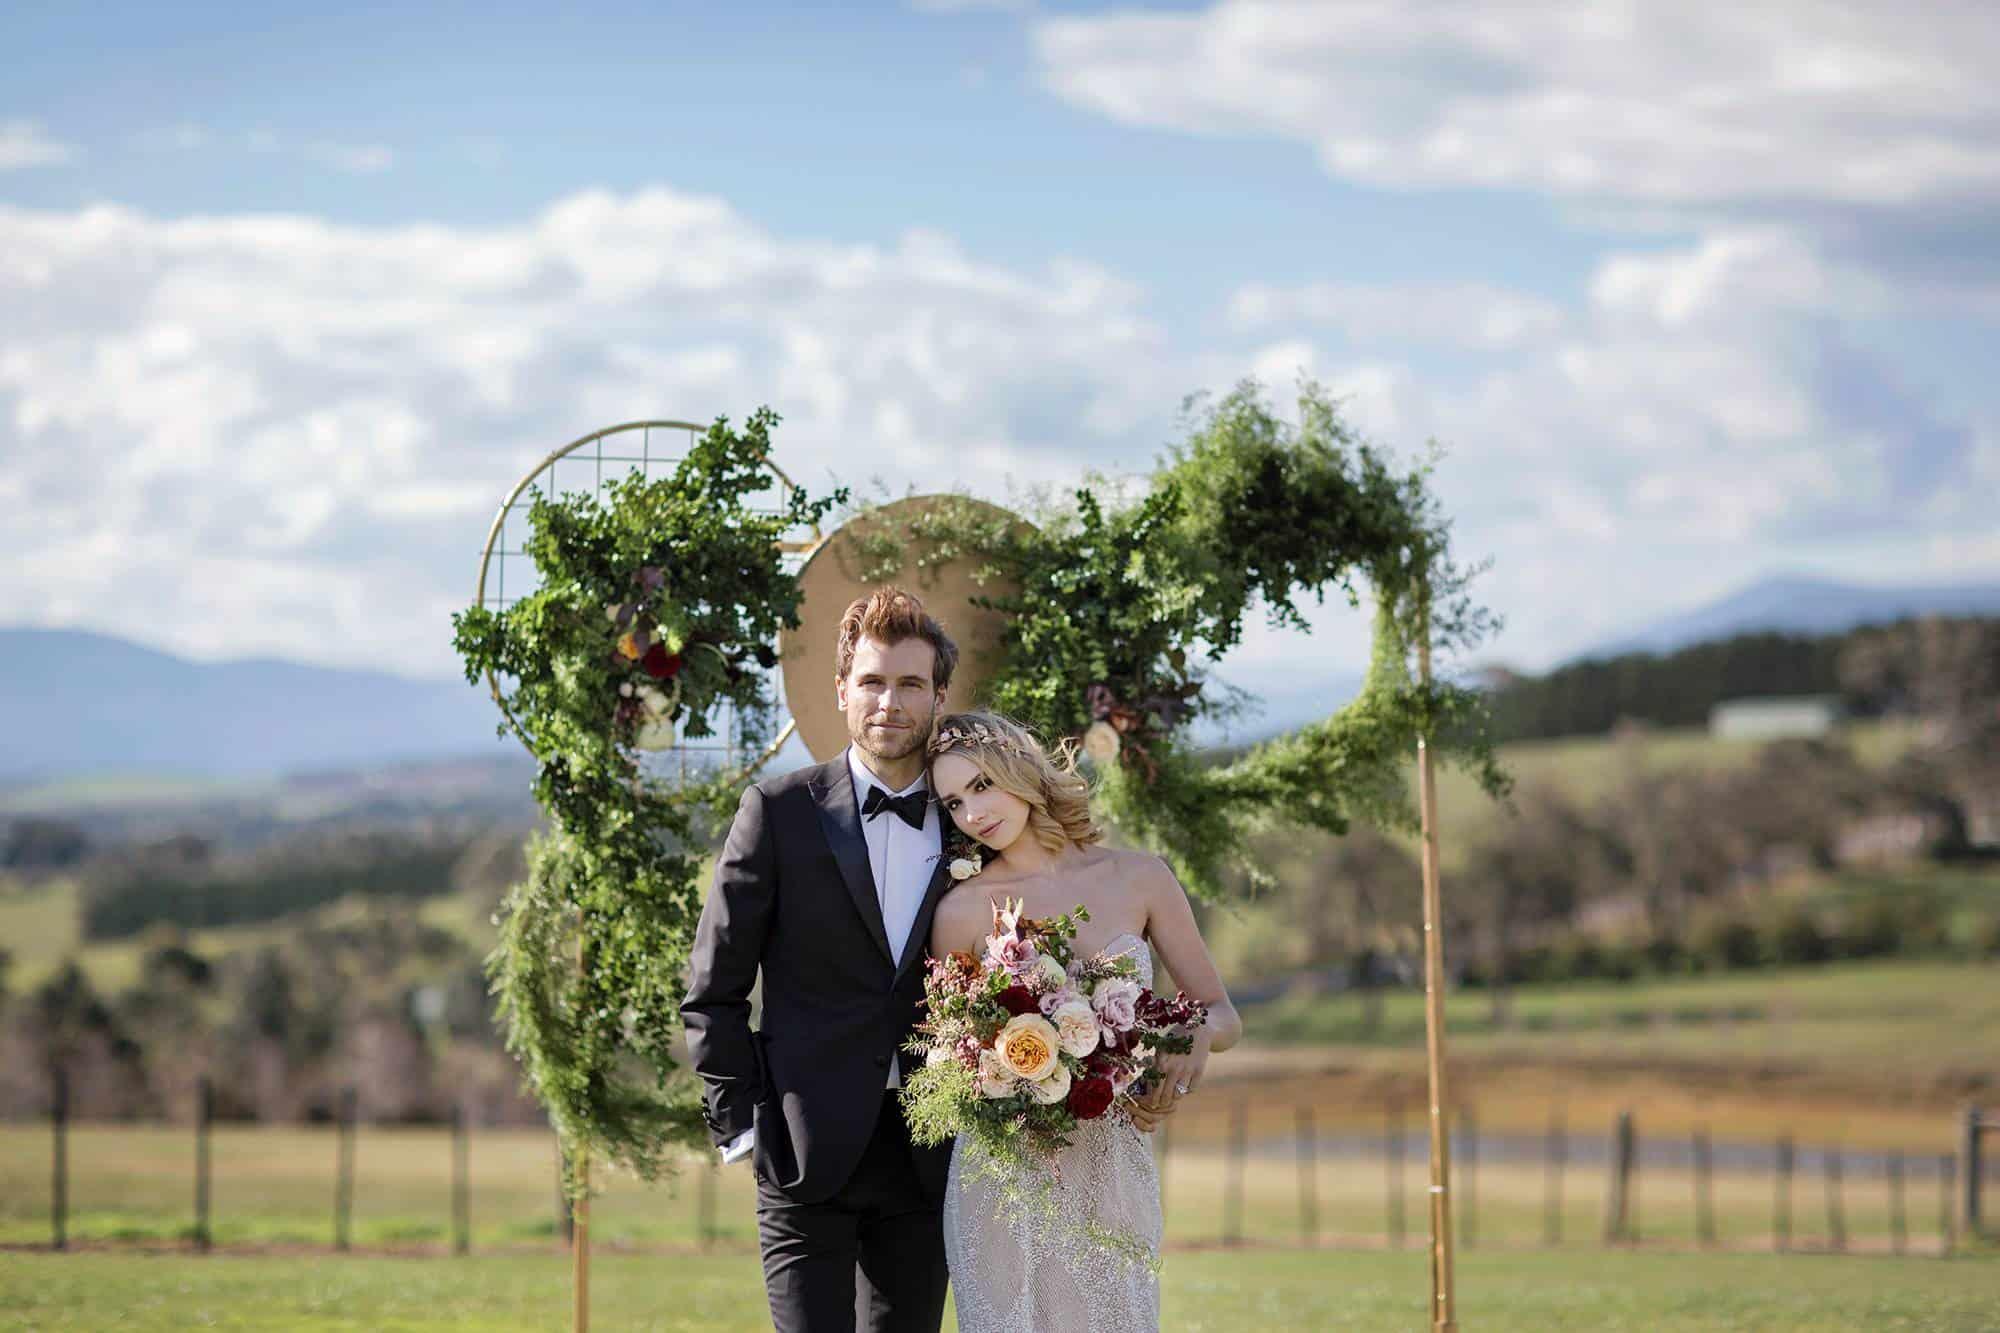 Melbourne's Best Wedding Venues - Vines of the Yarra Valley